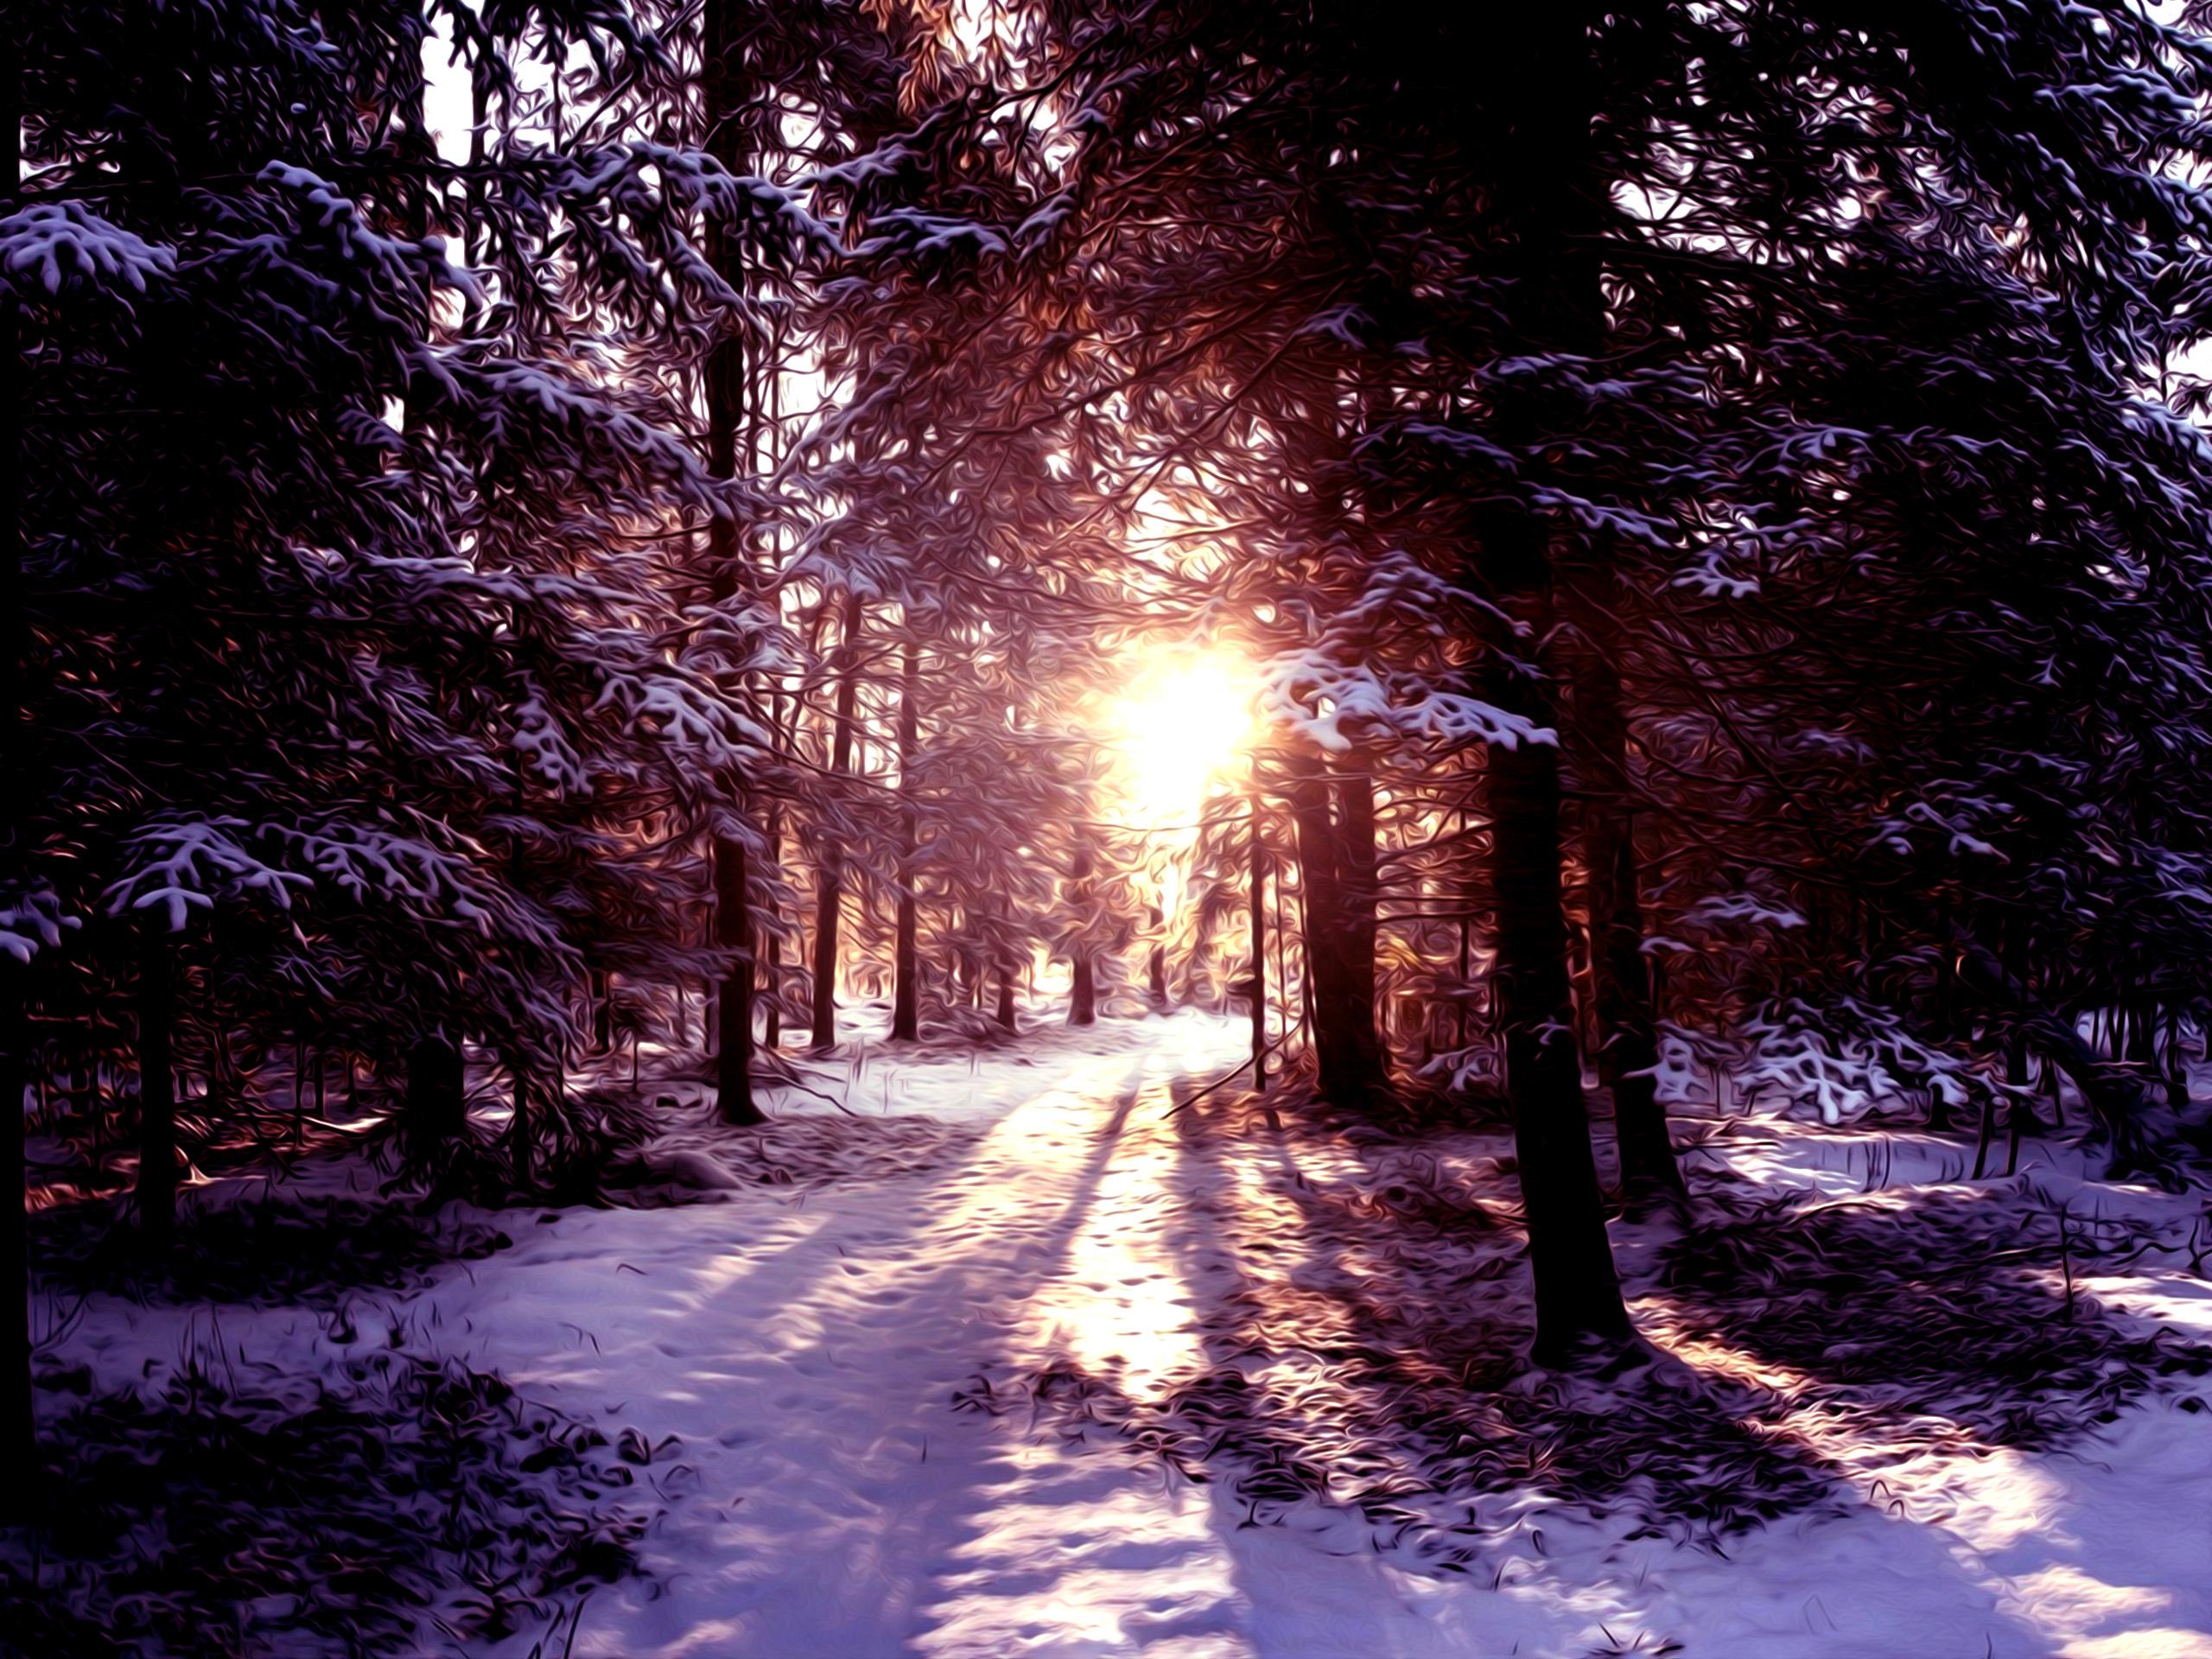 winter snow scene wallpapers   wwwhigh definition wallpapercom 2560x1920